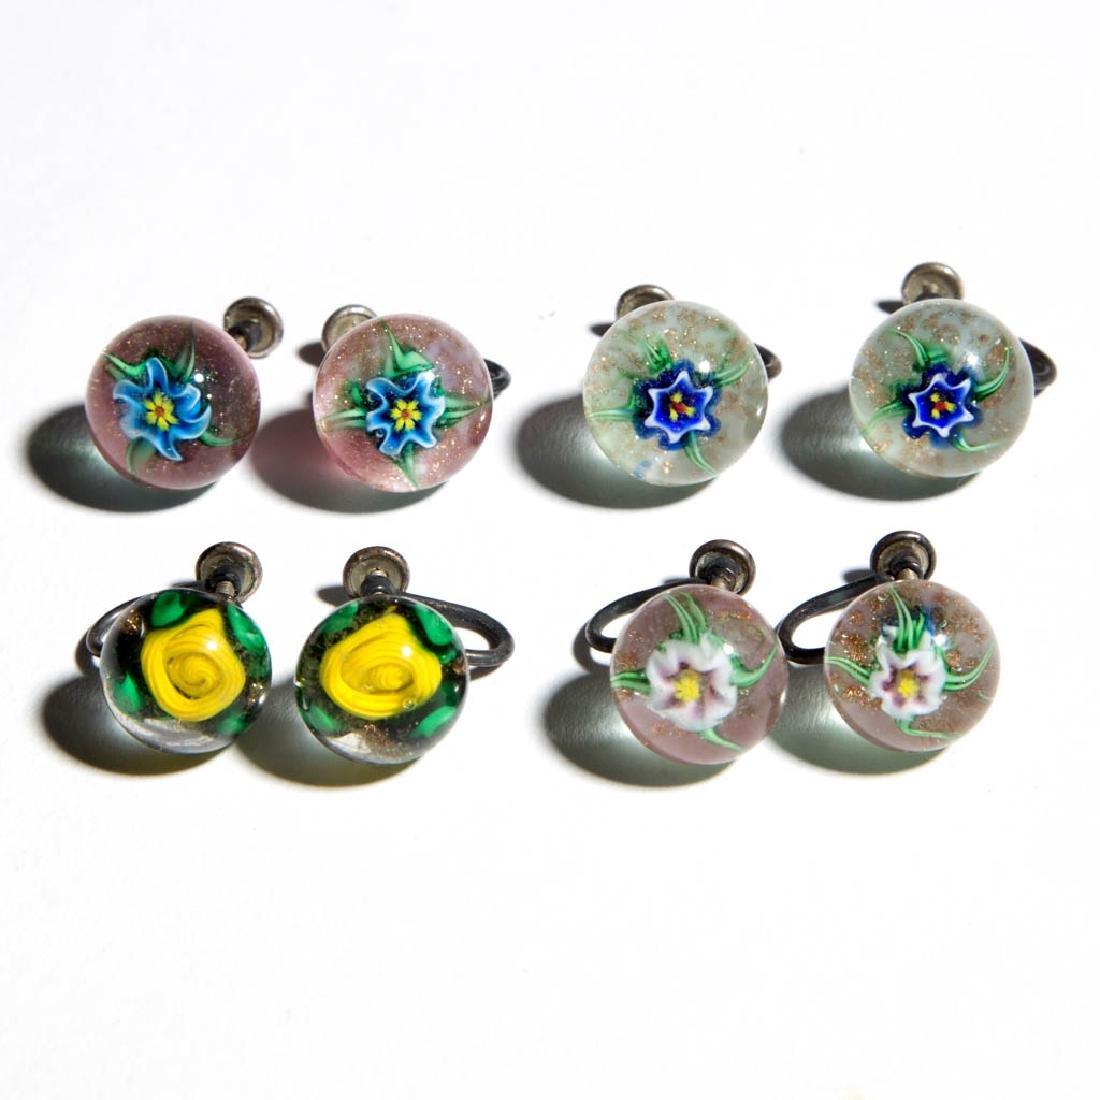 CHARLES KAZIUN STUDIO ART GLASS PAPERWEIGHT EARRINGS,